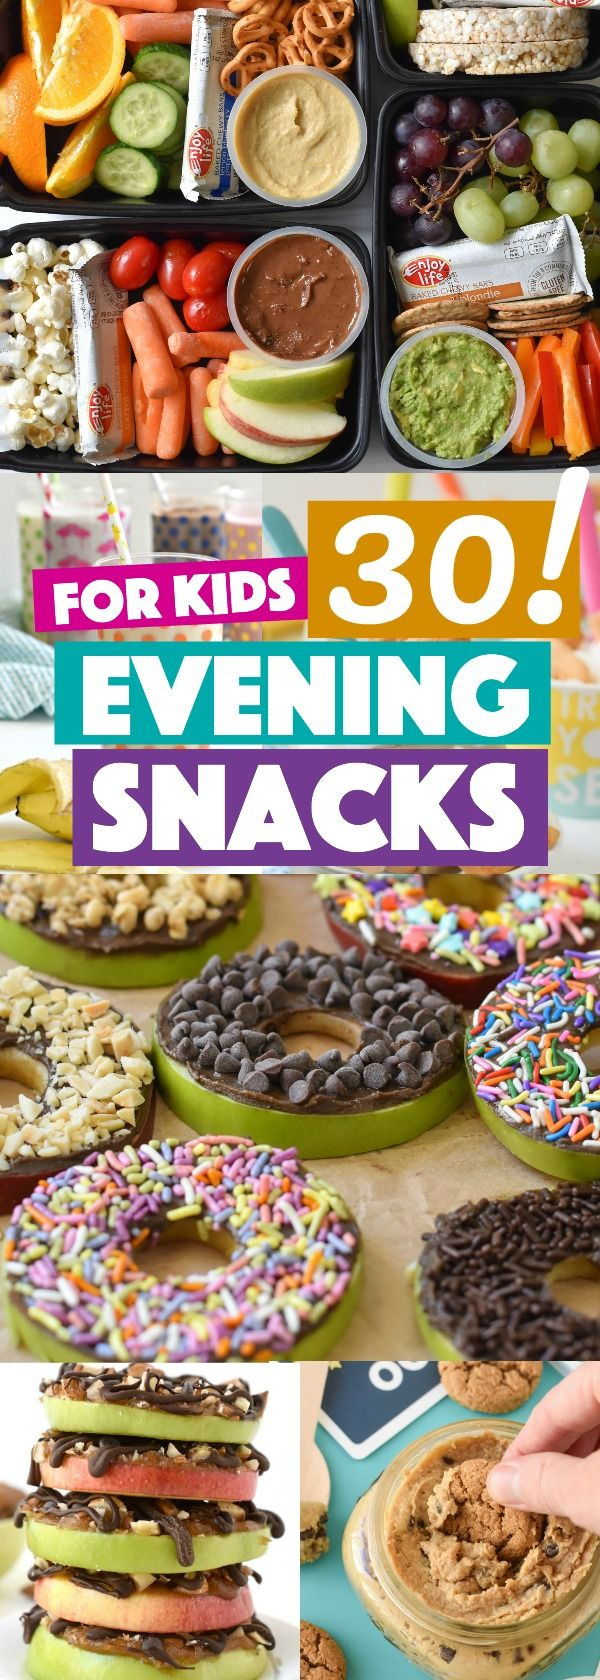 Healthy Evening Snacks  Best 25 Evening snacks ideas on Pinterest